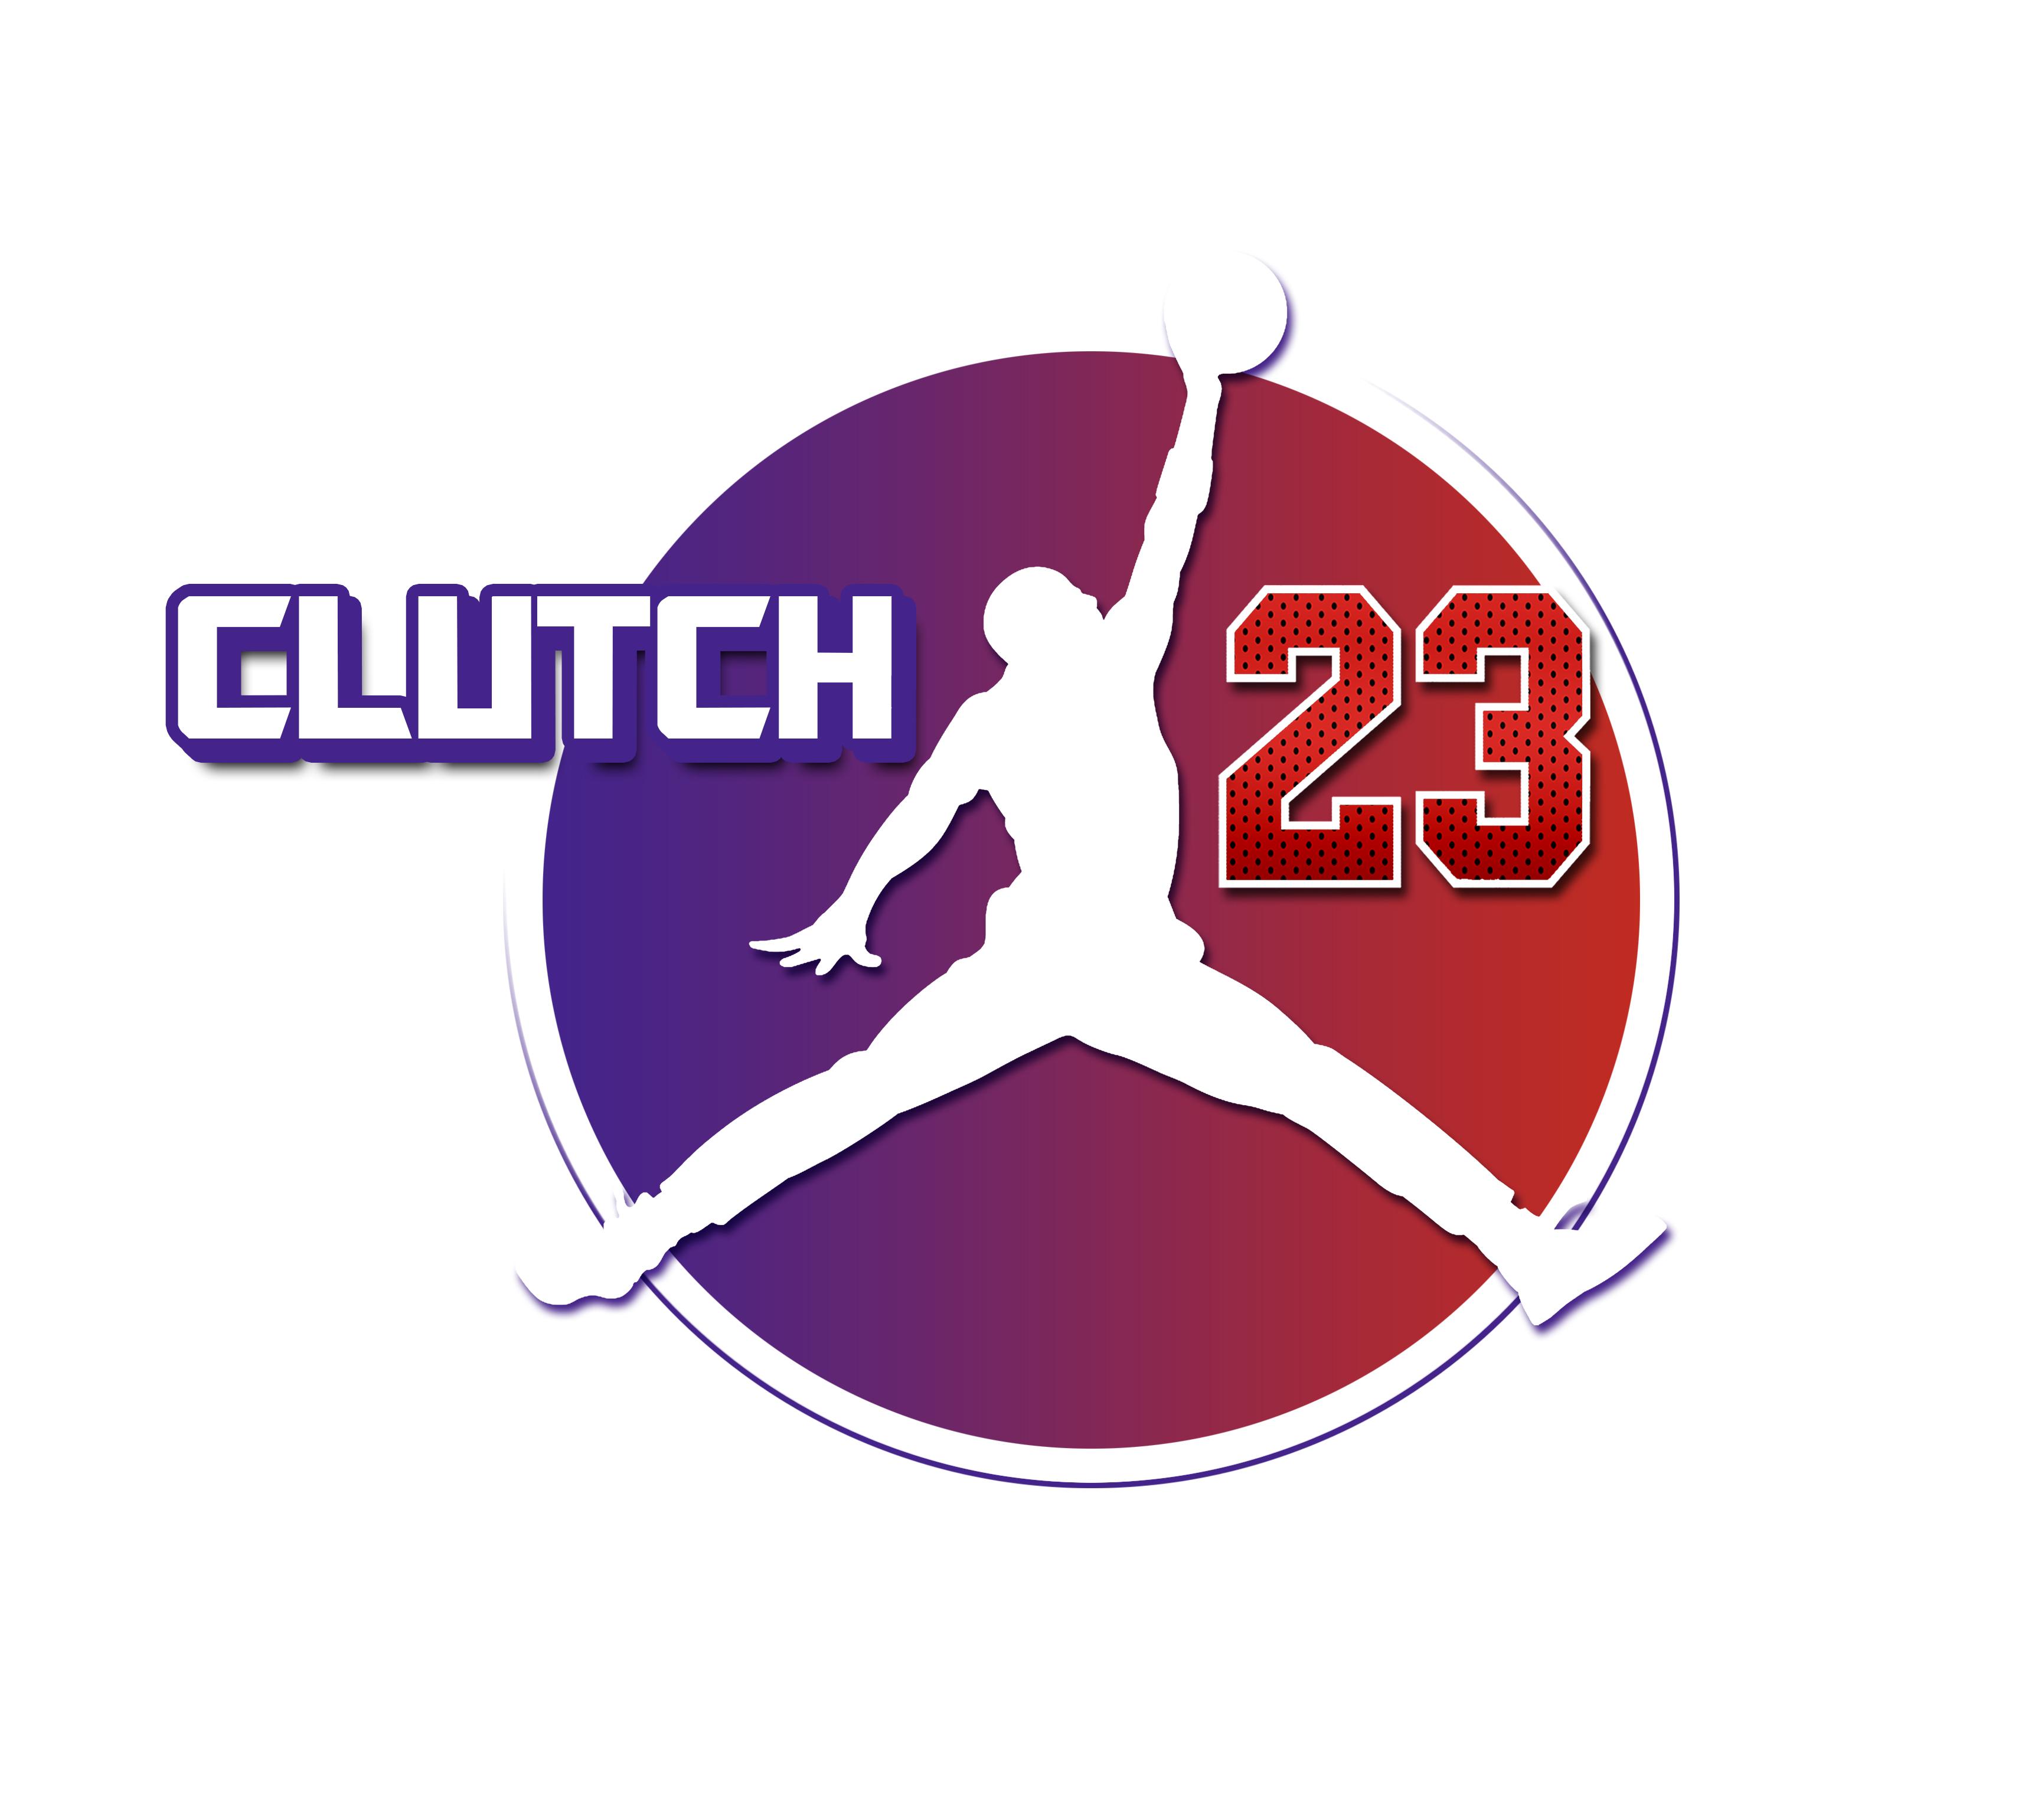 CLUTCH23 logo